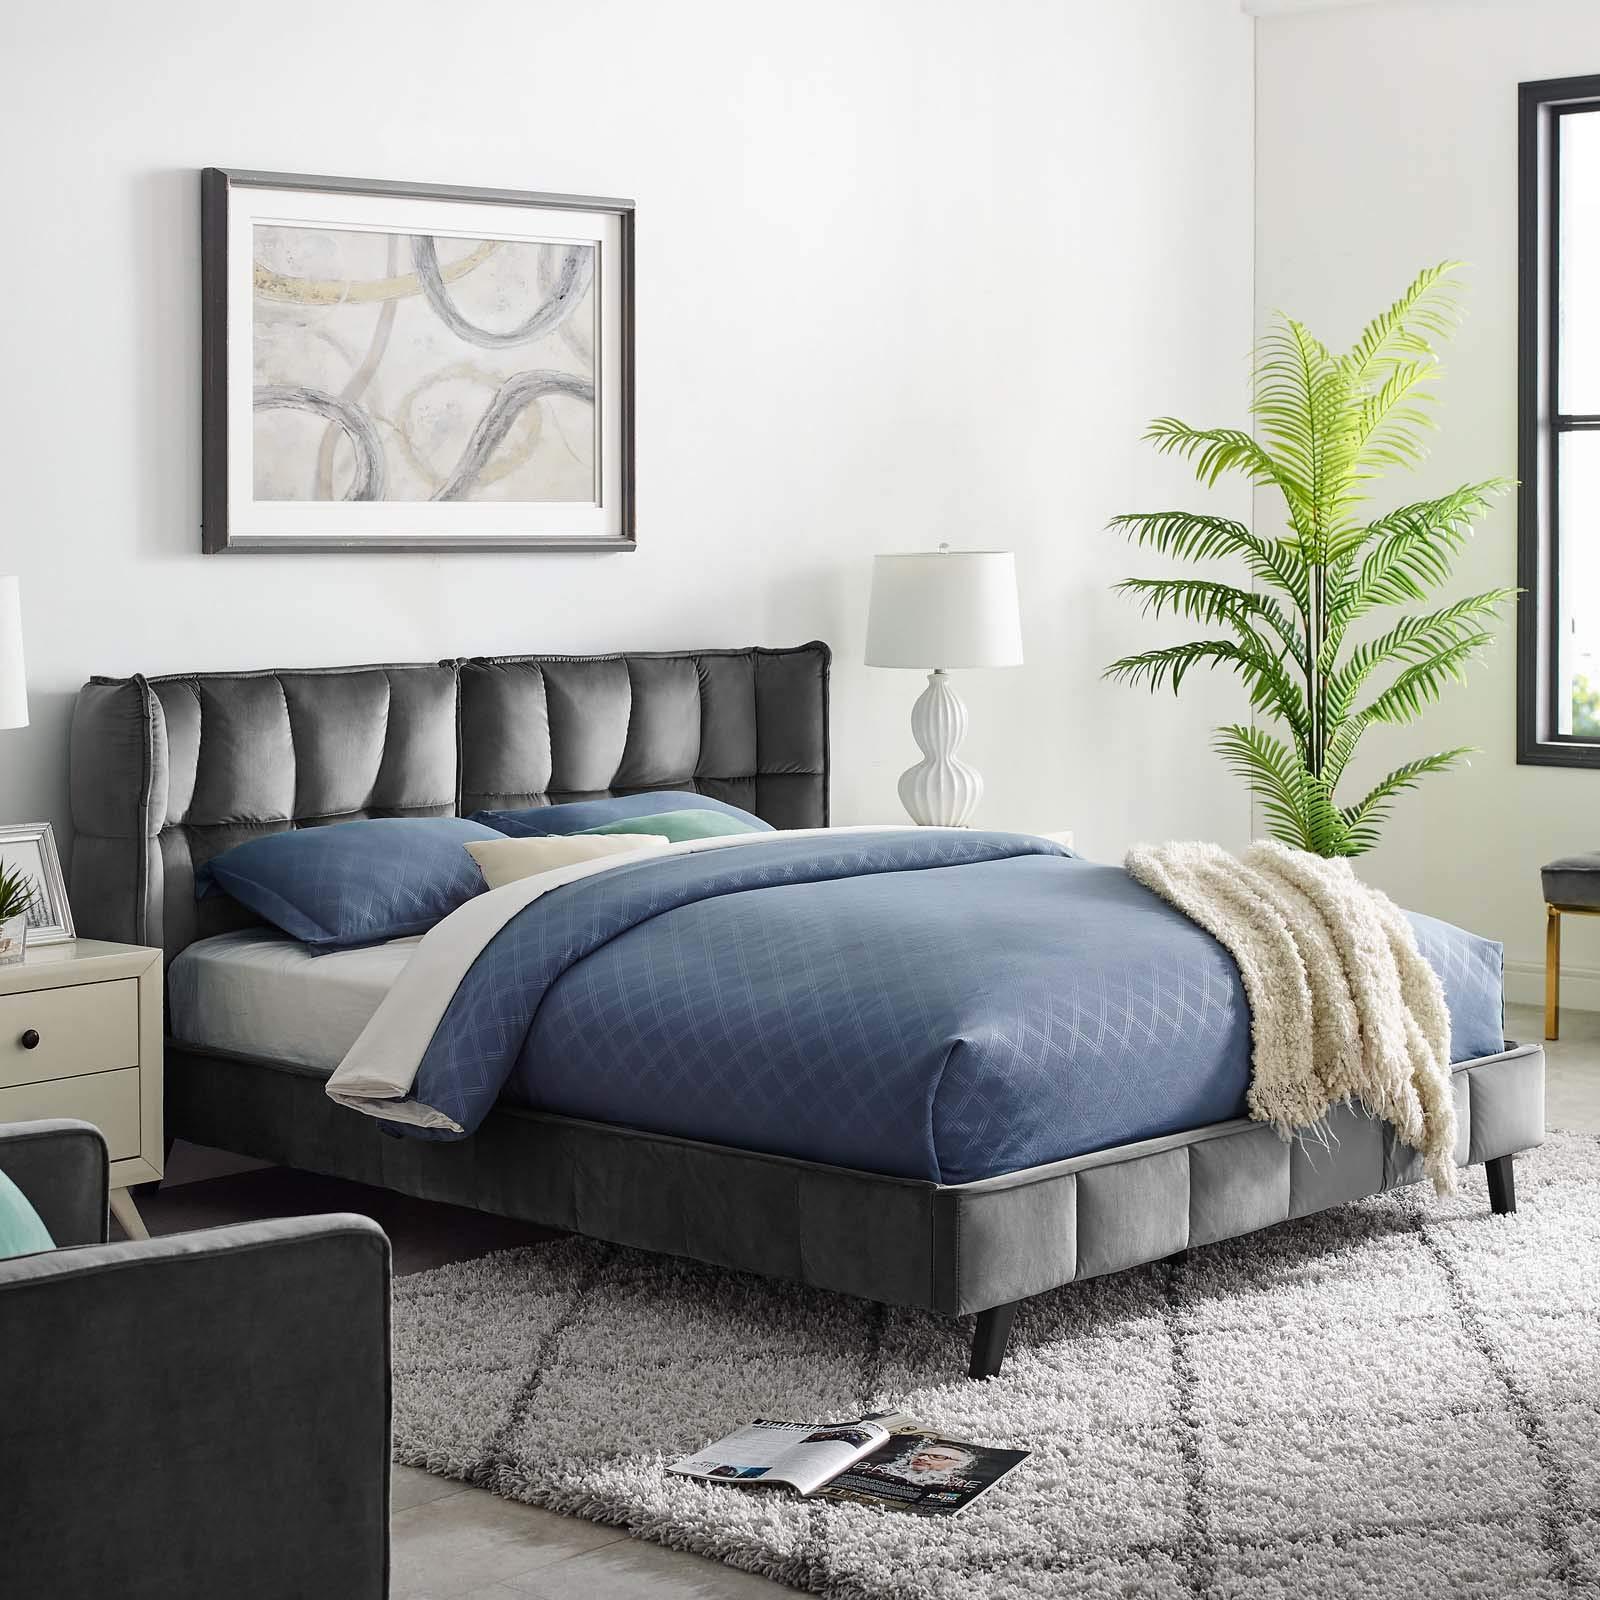 Modway MOD-6081-GRY Makenna Queen Upholstered Velvet Platform Bed, Gray